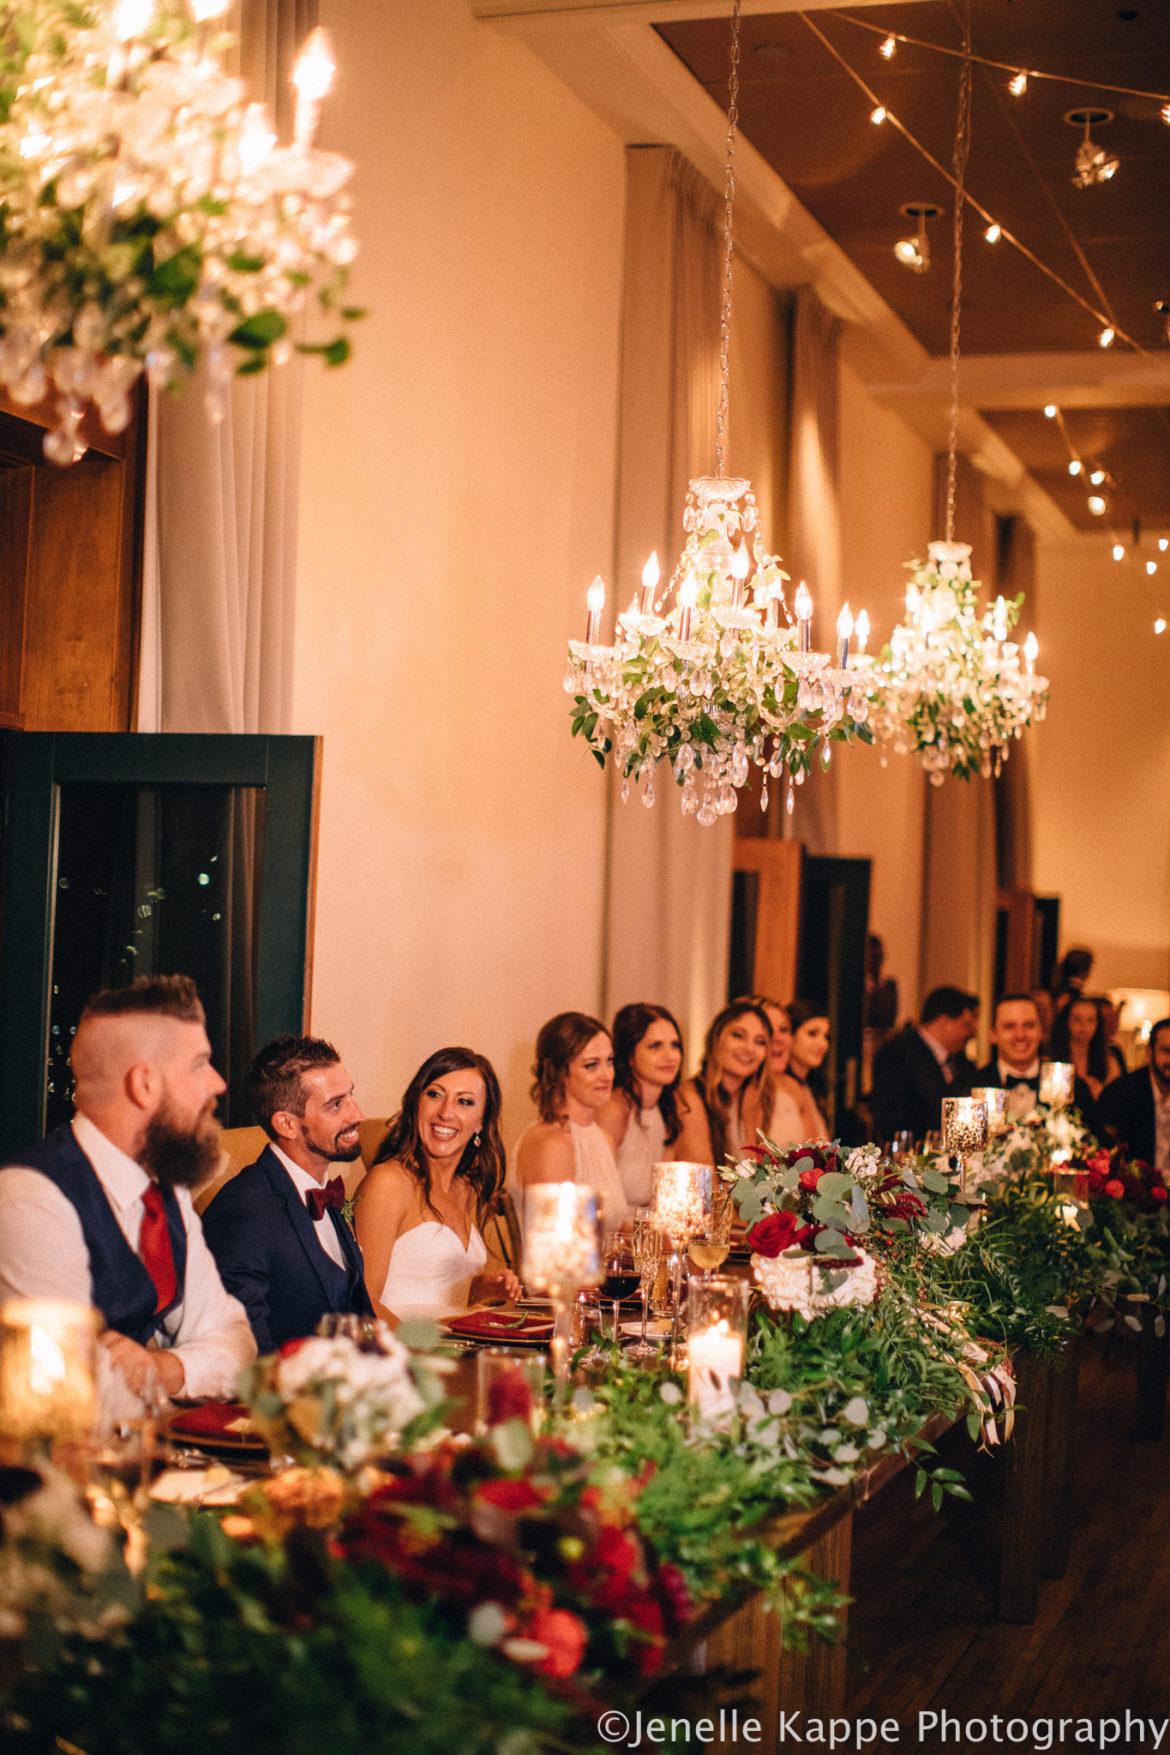 Elegant_Event_Lighting_Chicago_Ivy_Room_Wedding_Crystal_Chandelier_Greenery_Reception